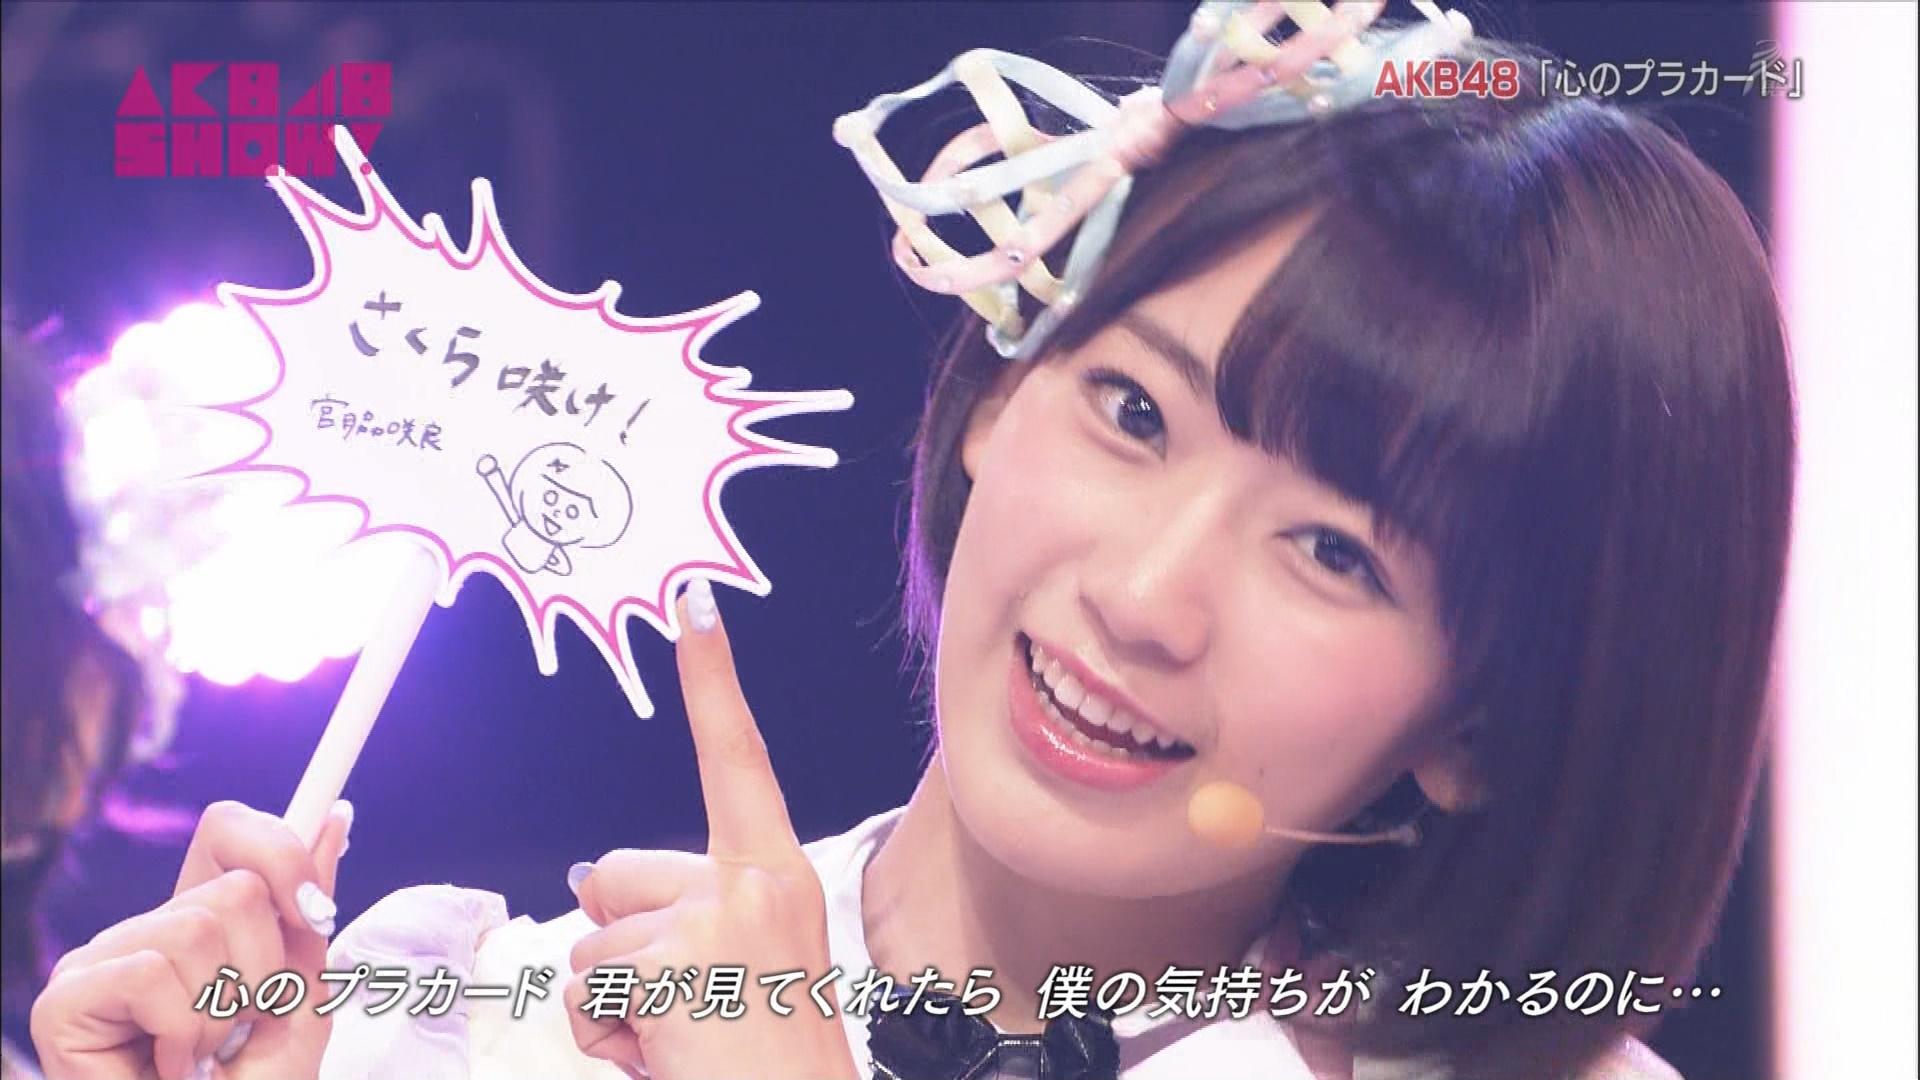 AKB48SHOW 心のプラカード 宮脇咲良 20140830 (19)